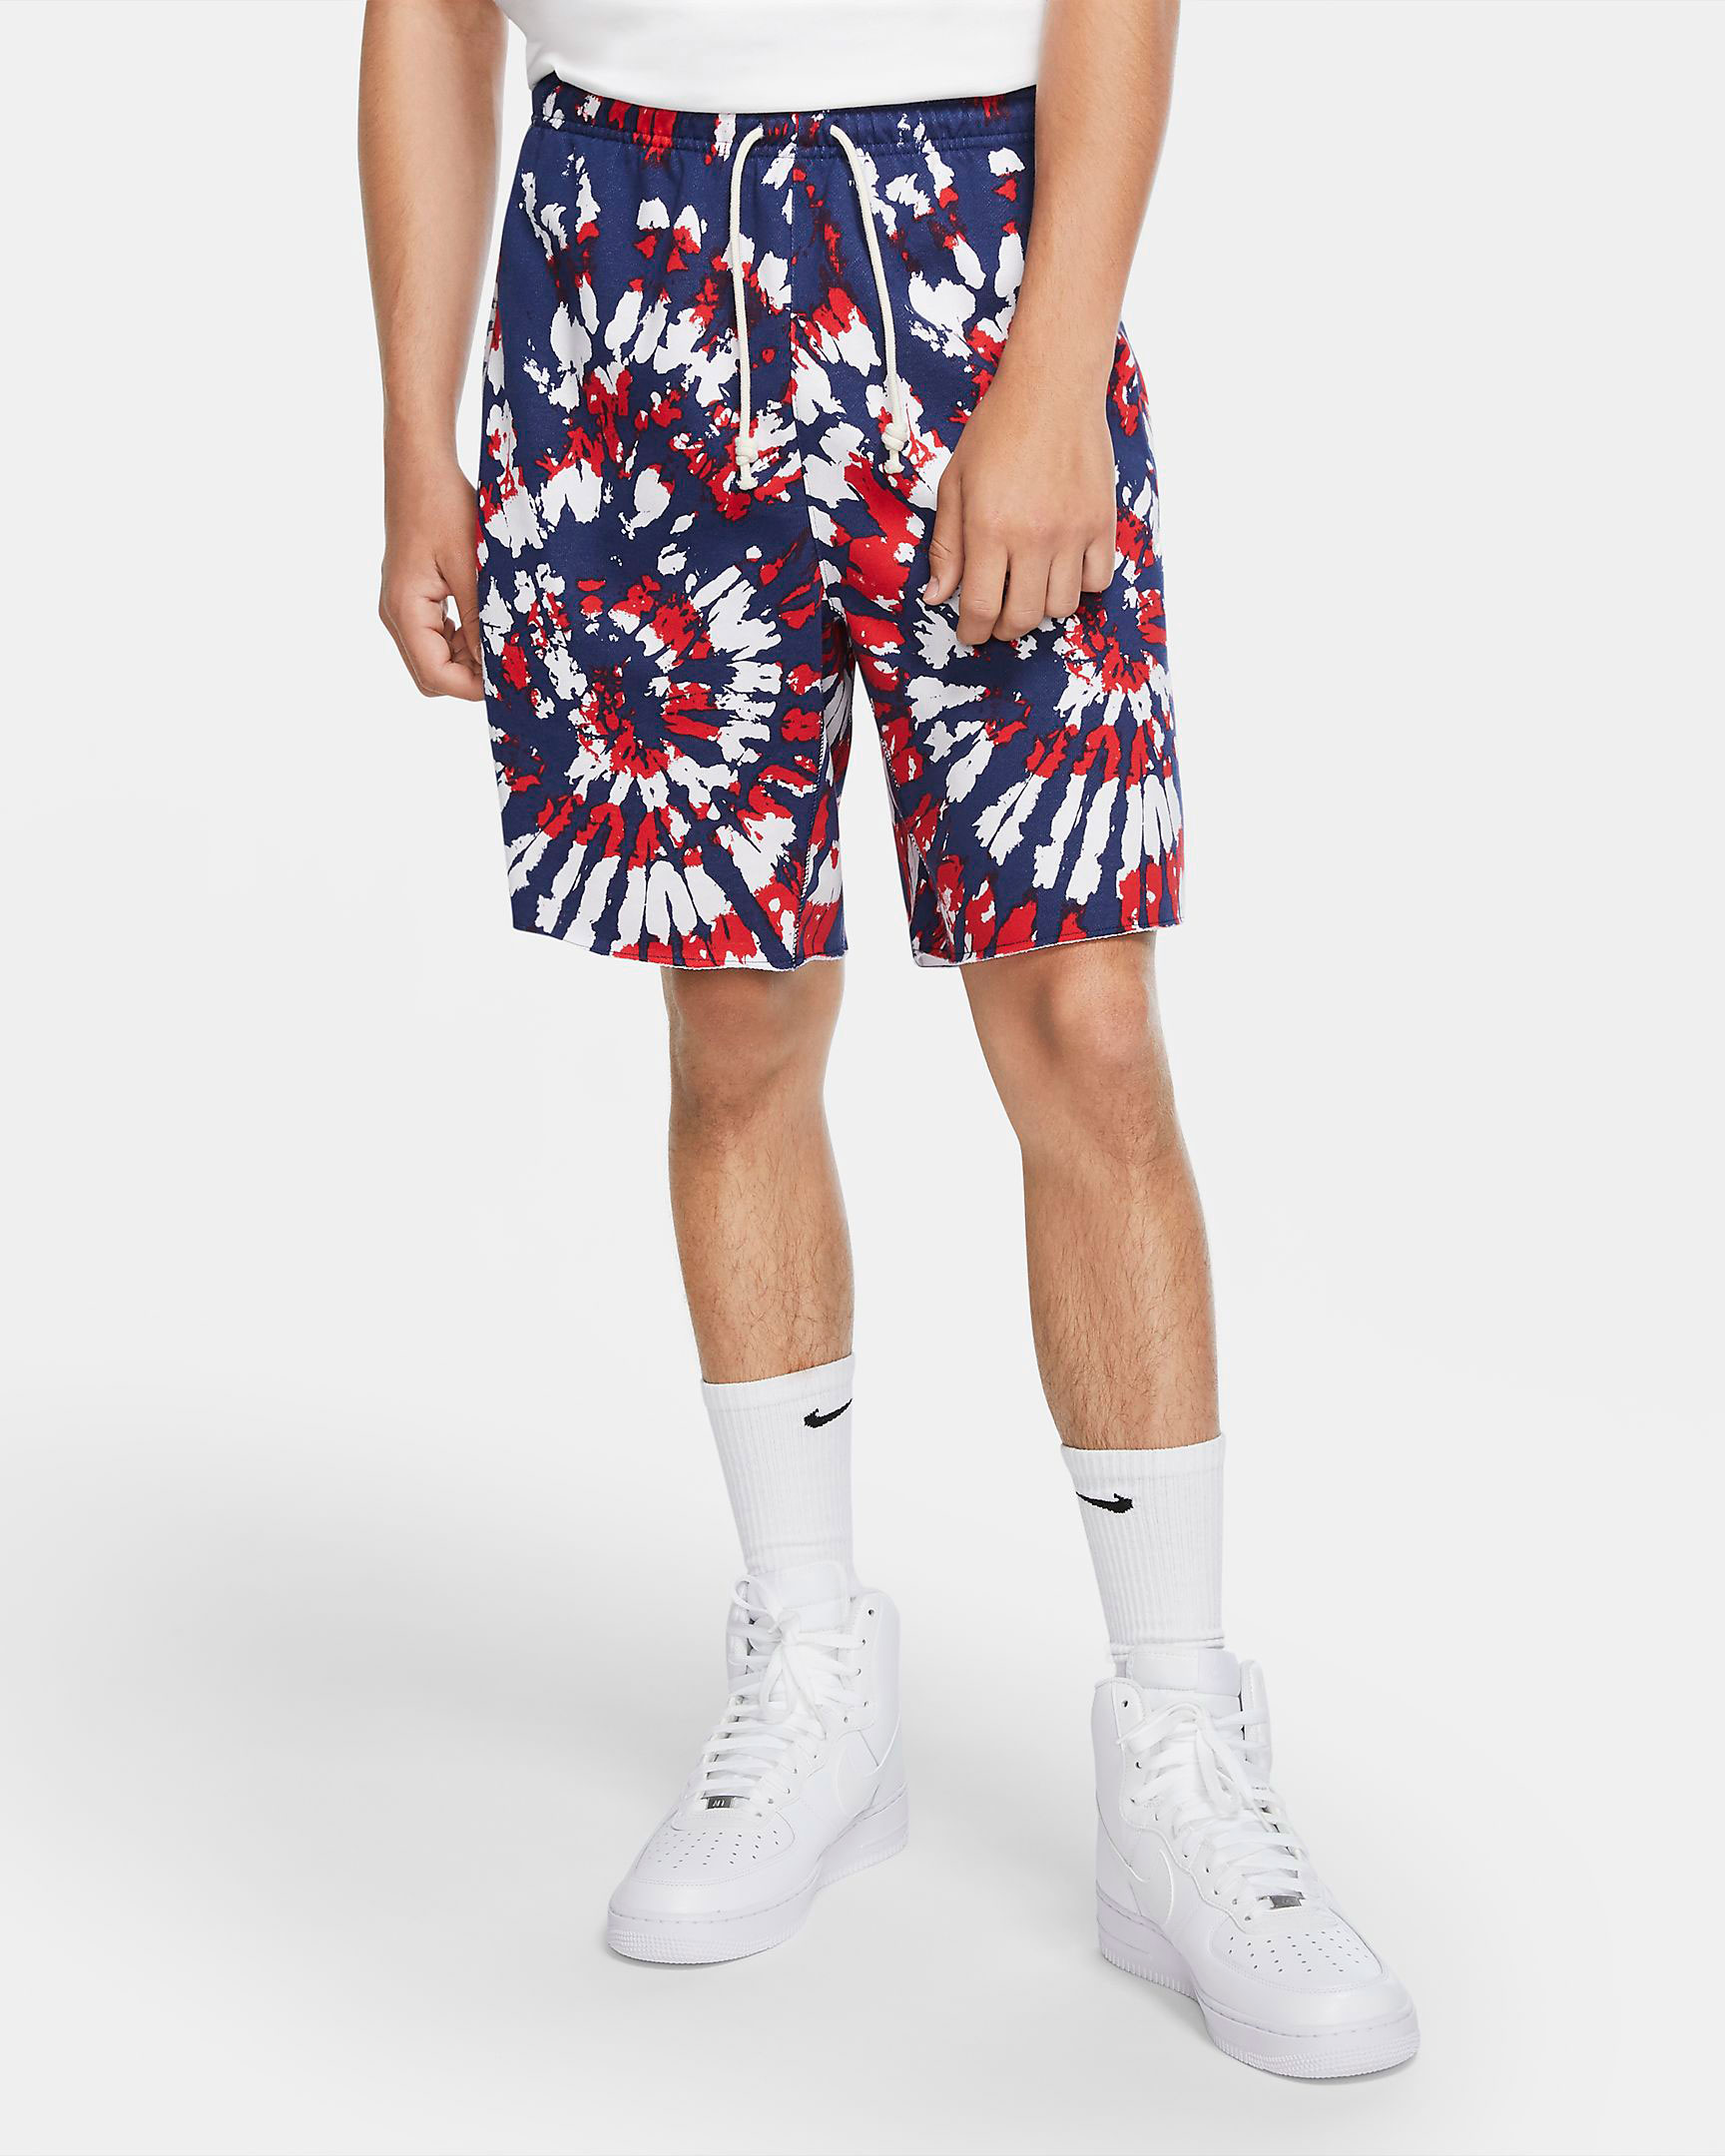 nike-usa-basketball-tie-dye-shorts